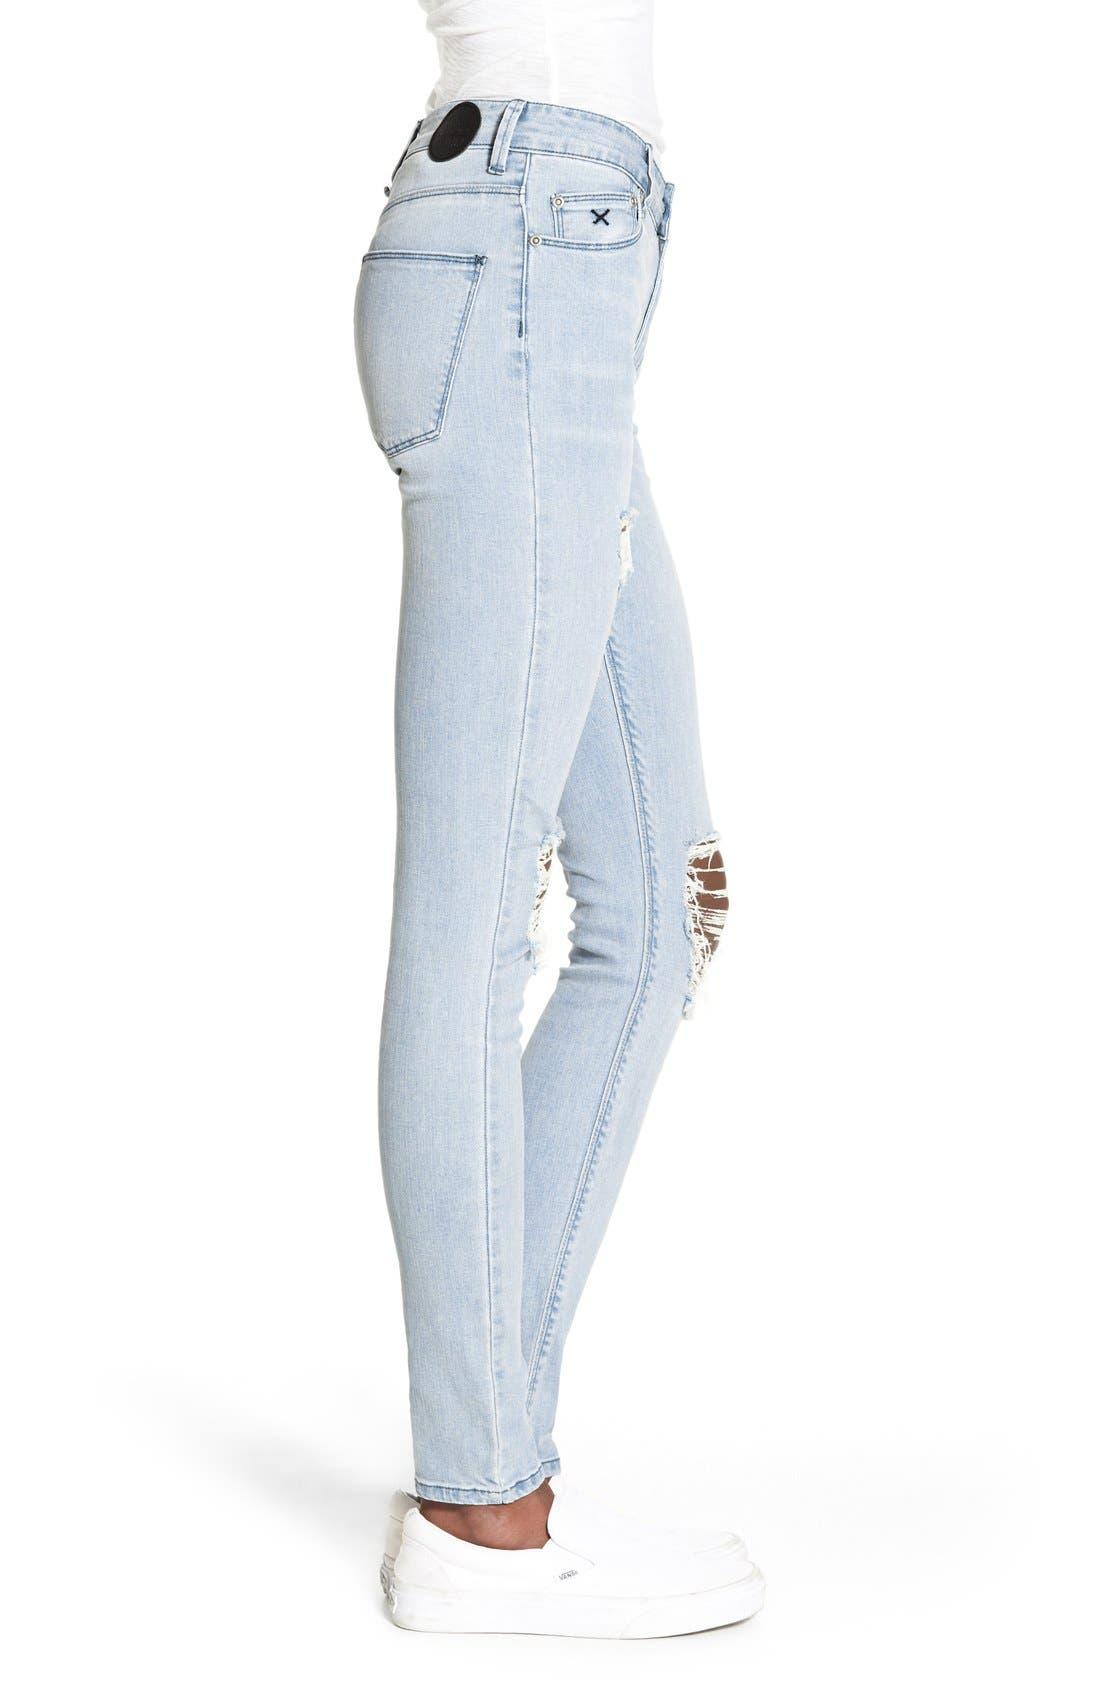 Alternate Image 3  - RES Denim 'Kitty' Skinny Jeans (Love Moves Destroyer)